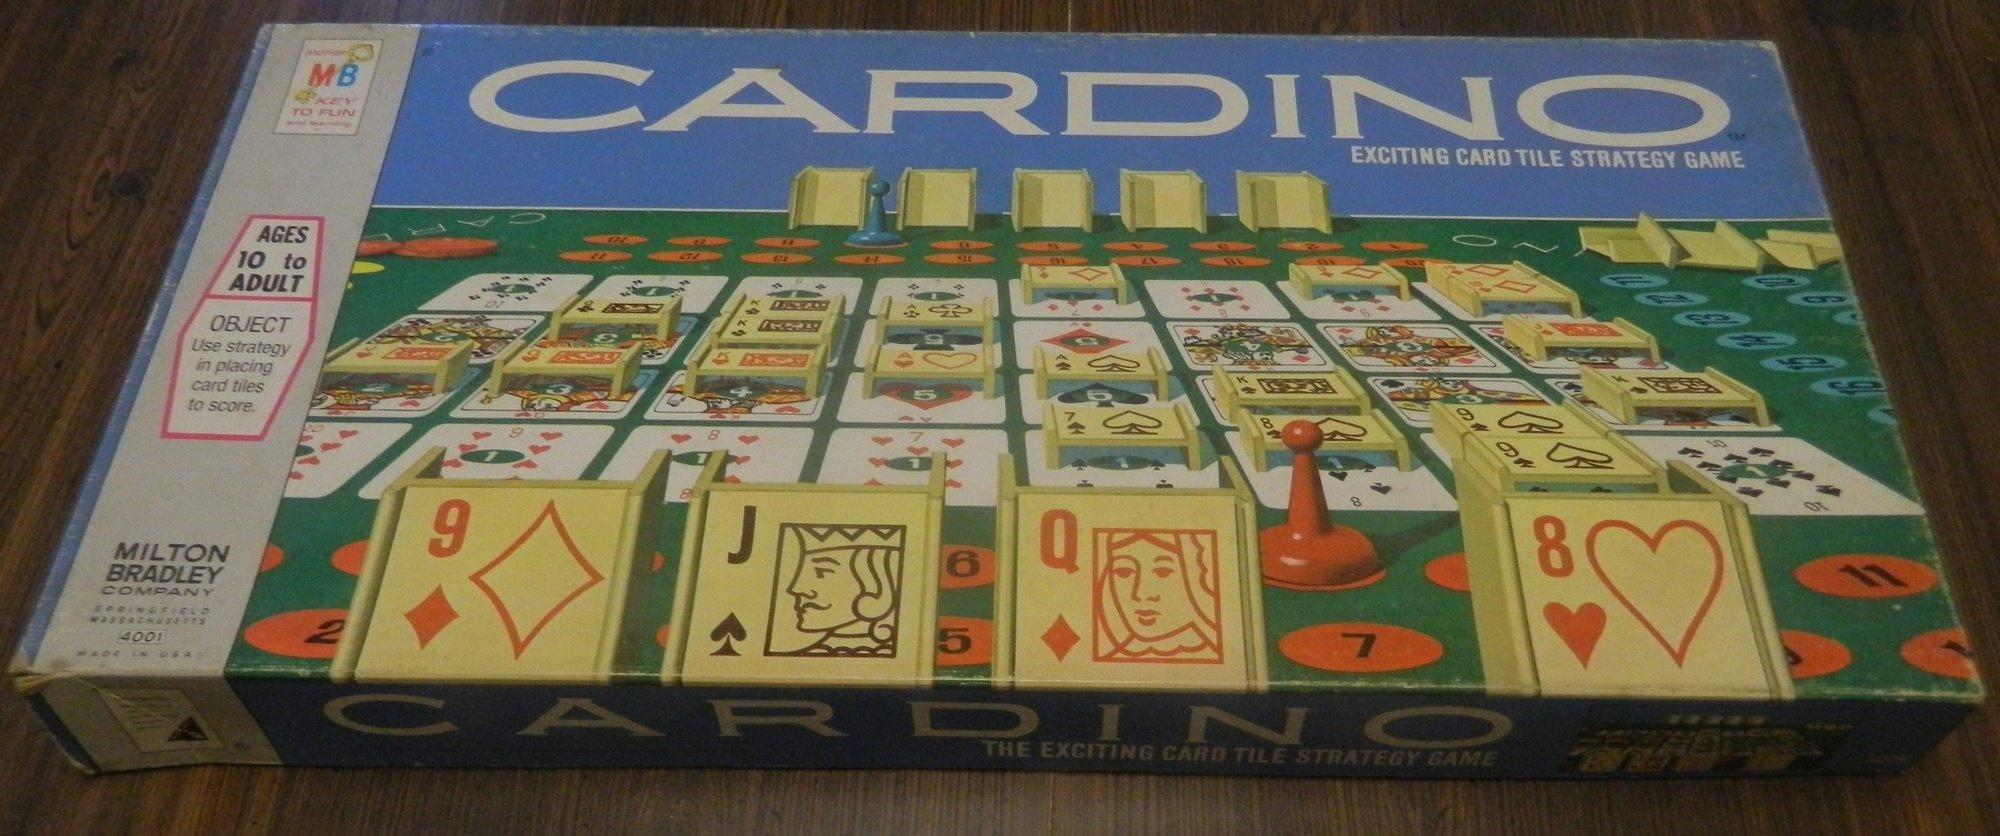 Cardino Box